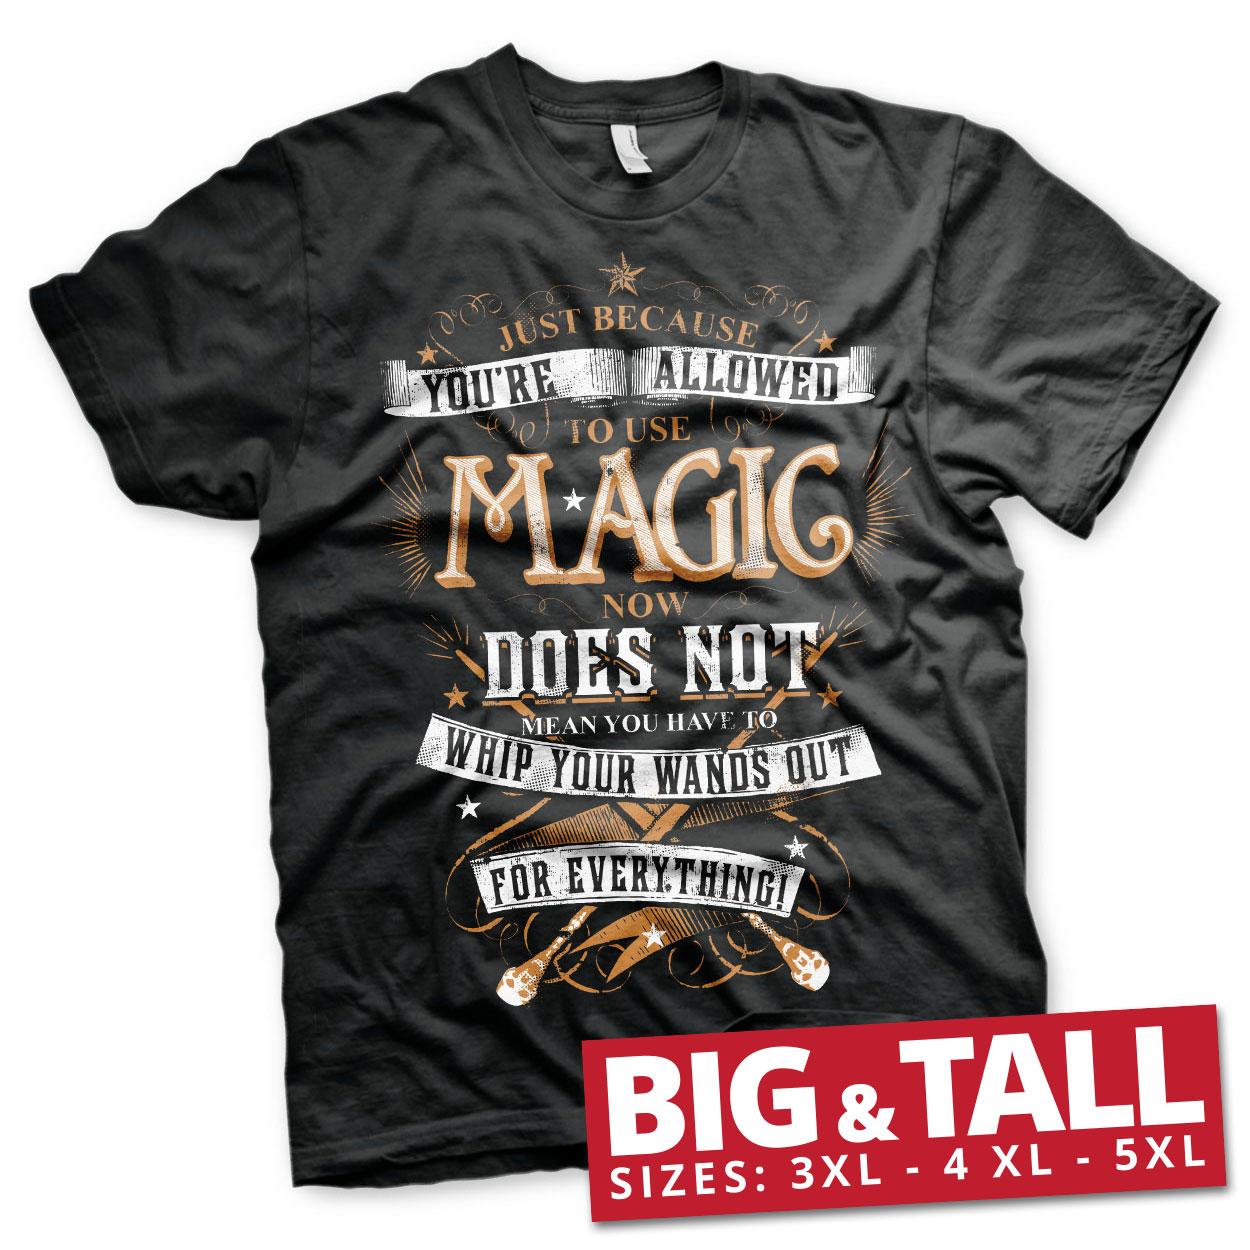 Harry Potter Magic Big & Tall T-Shirt